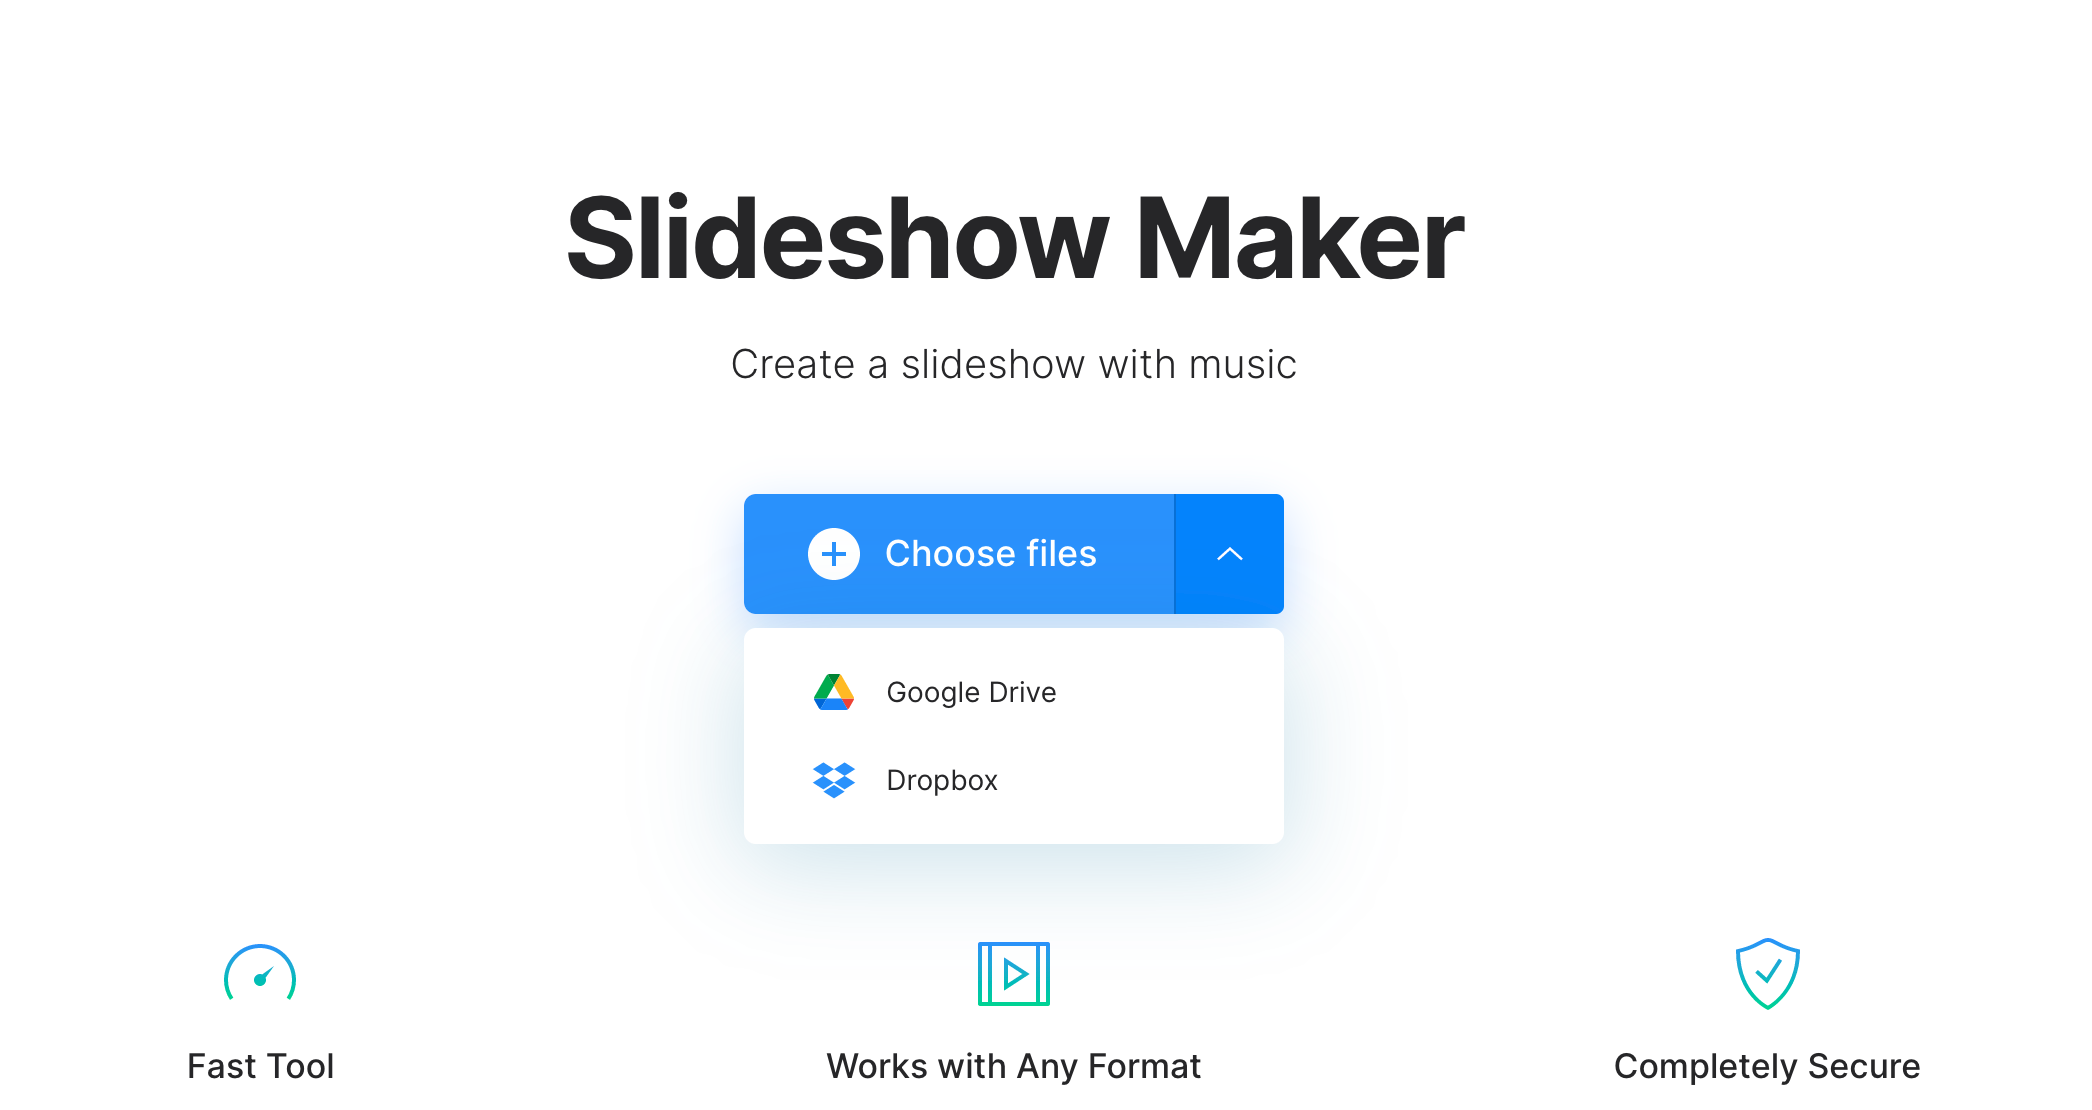 Upload photos to make slideshow on Mac